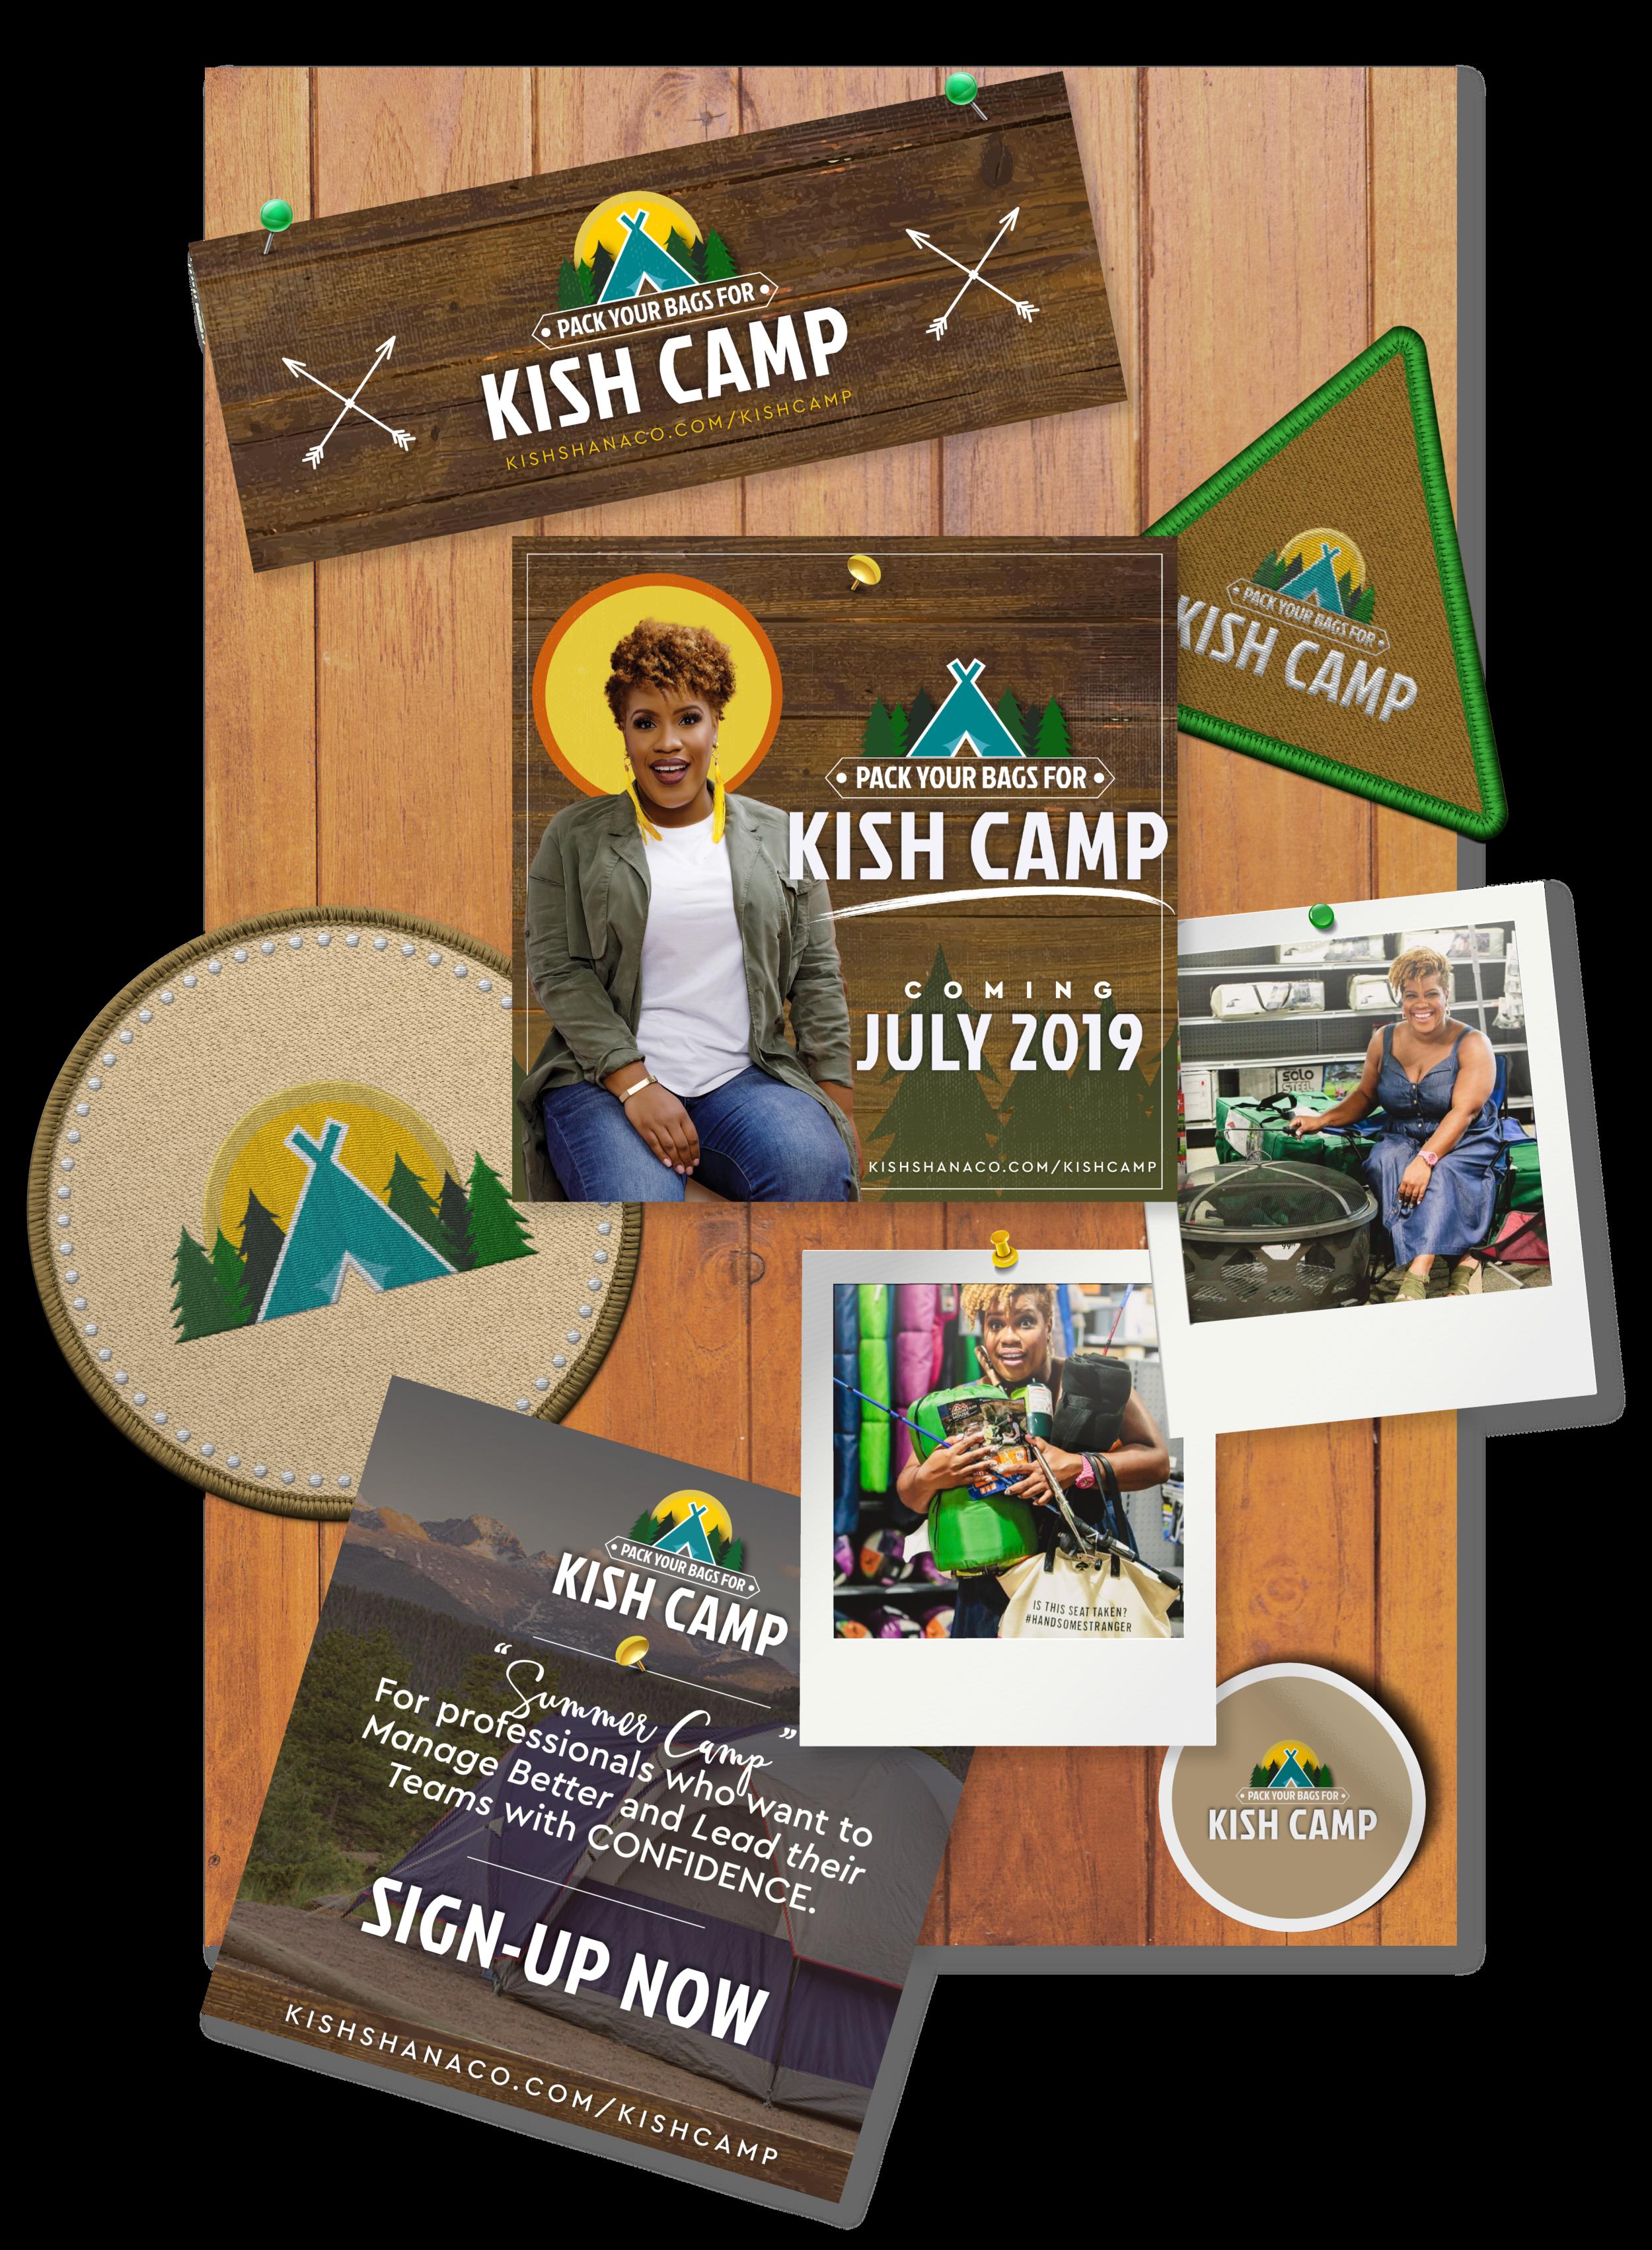 Kishshana_Kish_Camp_Brand_Collateral